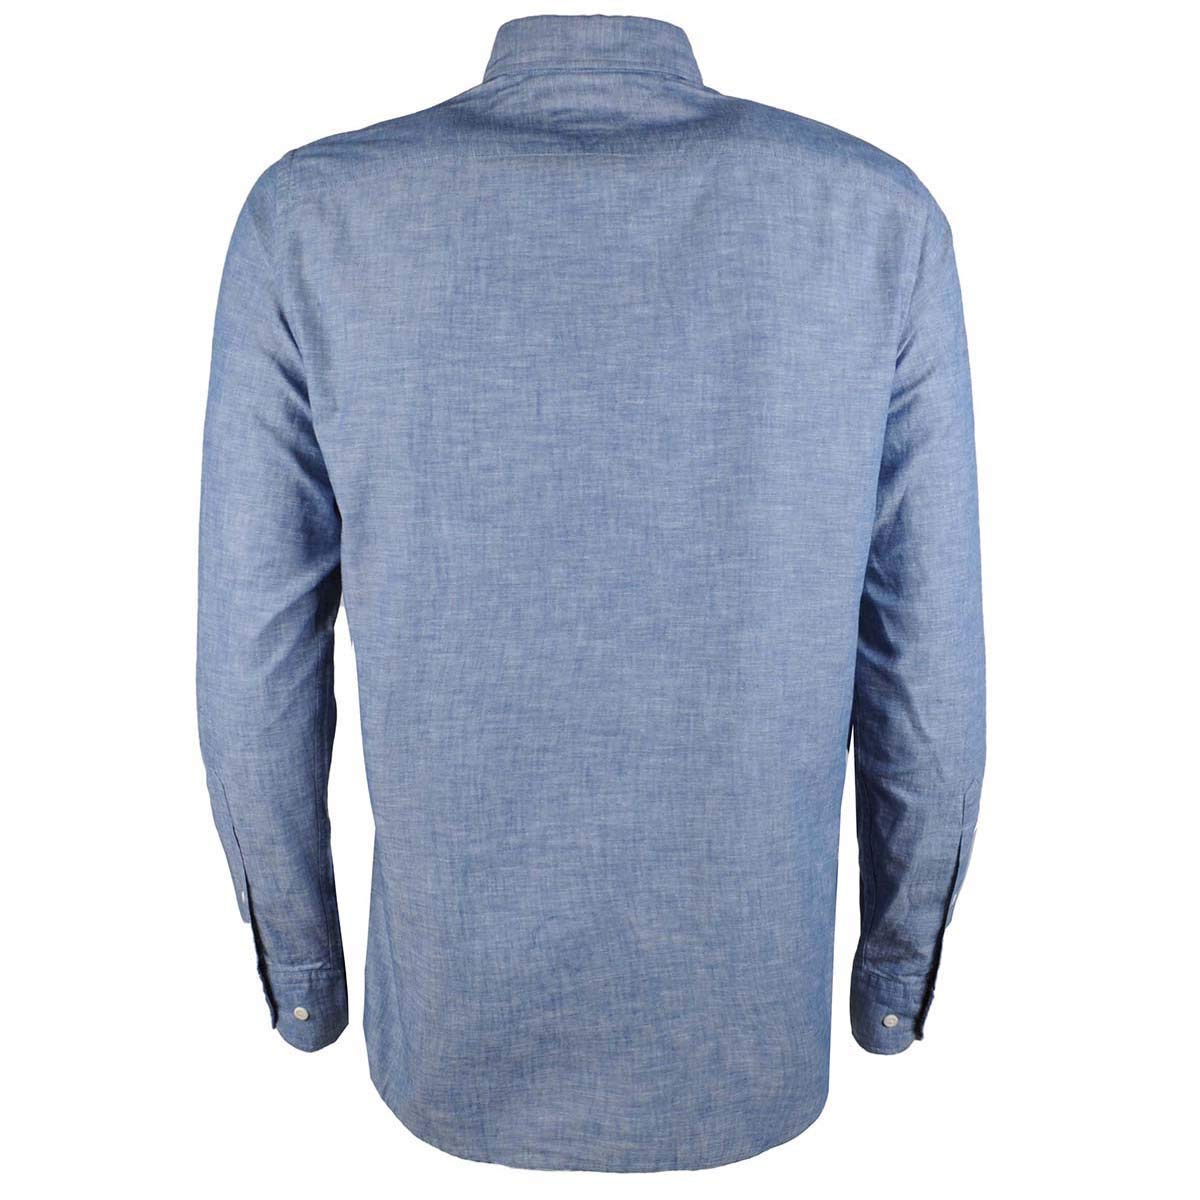 7a433235 Tommy Hilfiger Men's Regular Fit Chambray Flag Patch Shirt Indigo XL:  Amazon.co.uk: Clothing